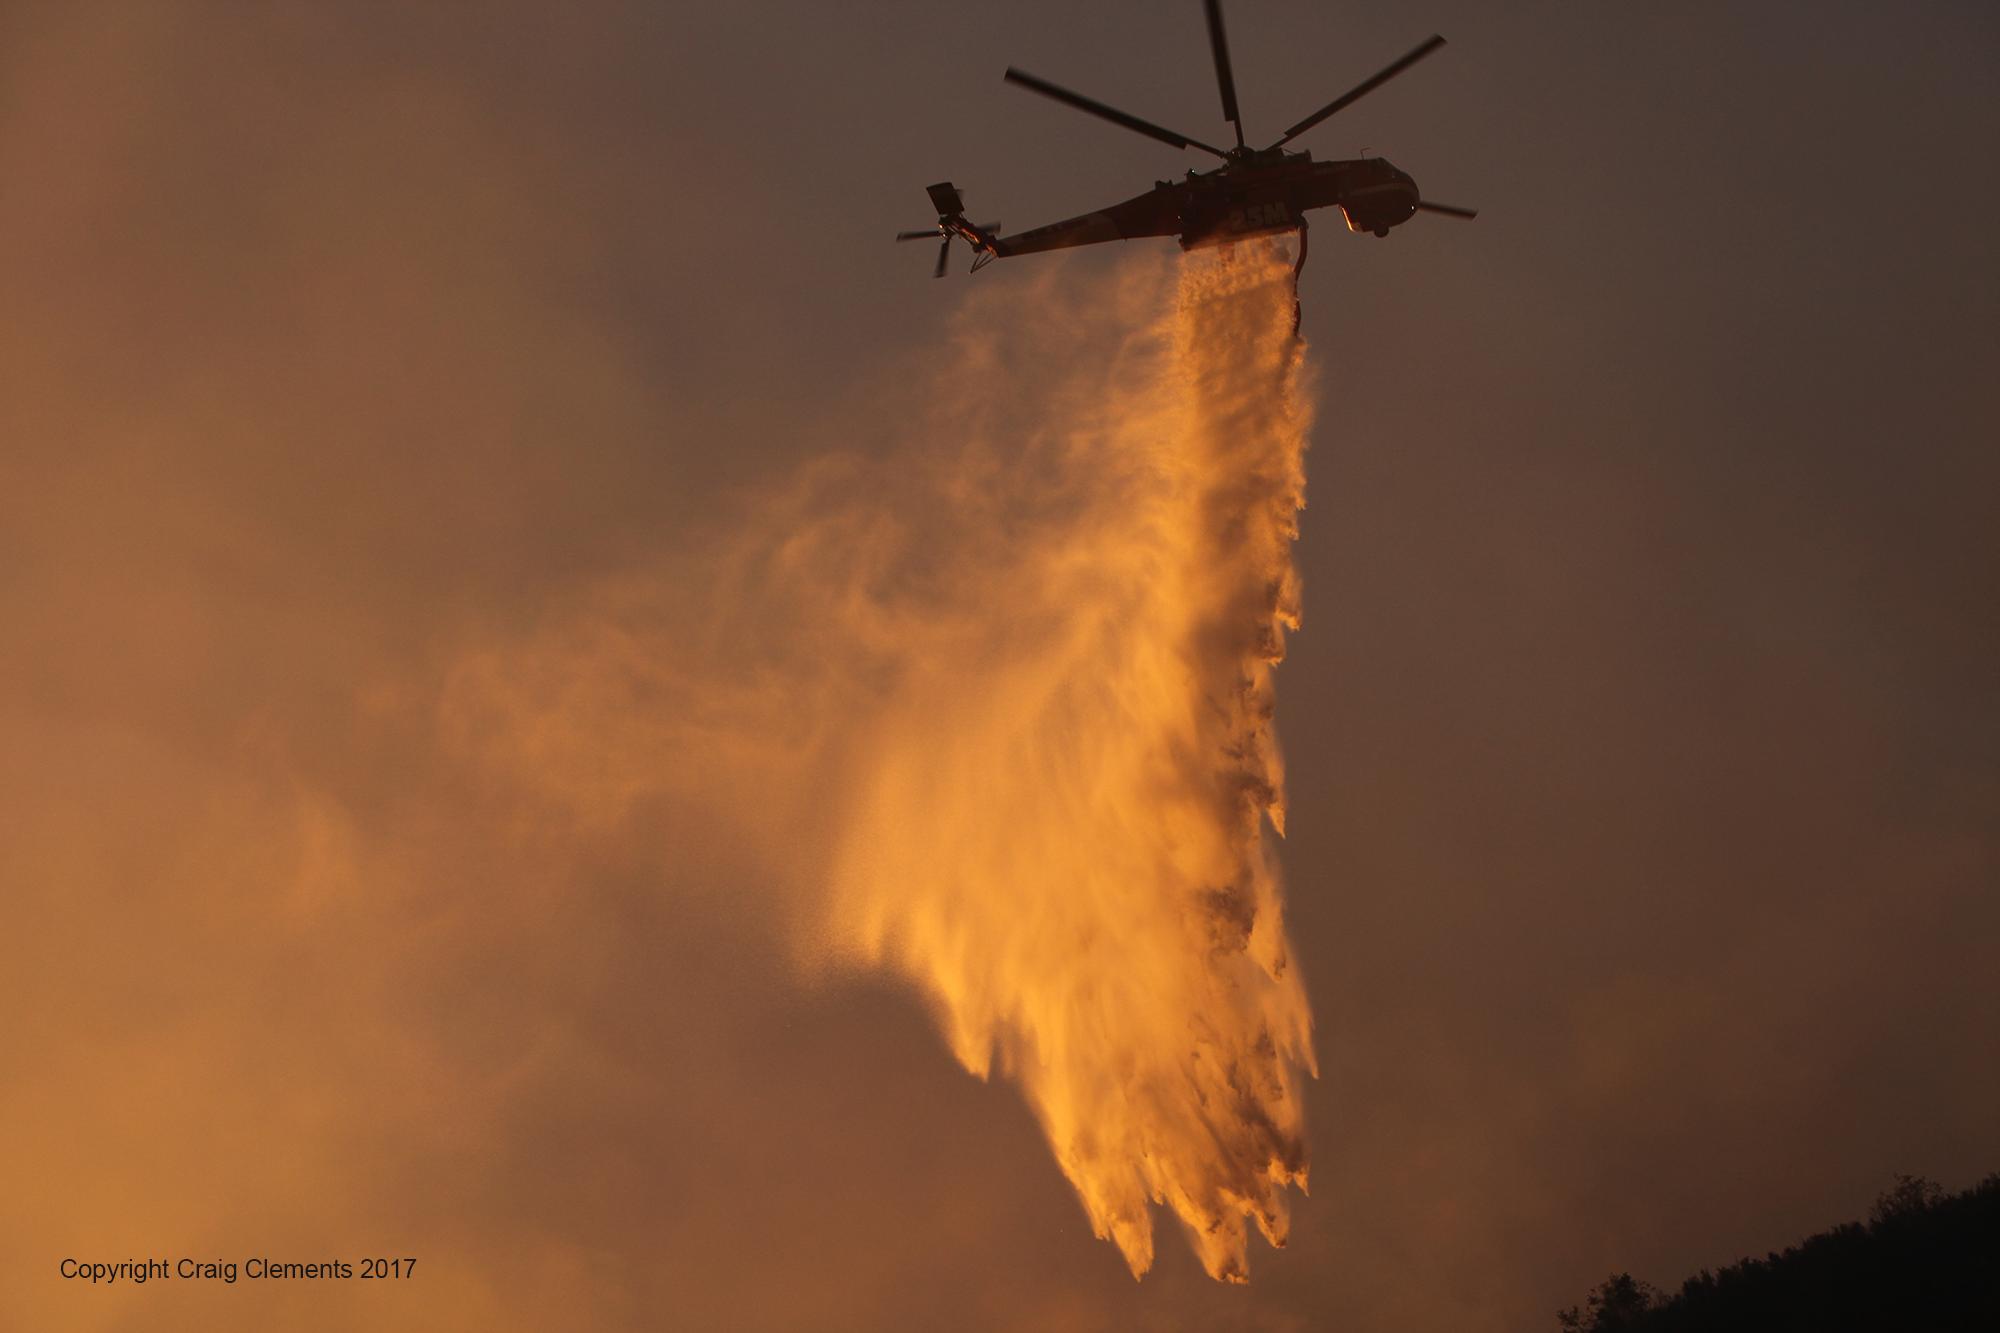 water drop on Detwiler Fire, Mariposa, California, 2017.